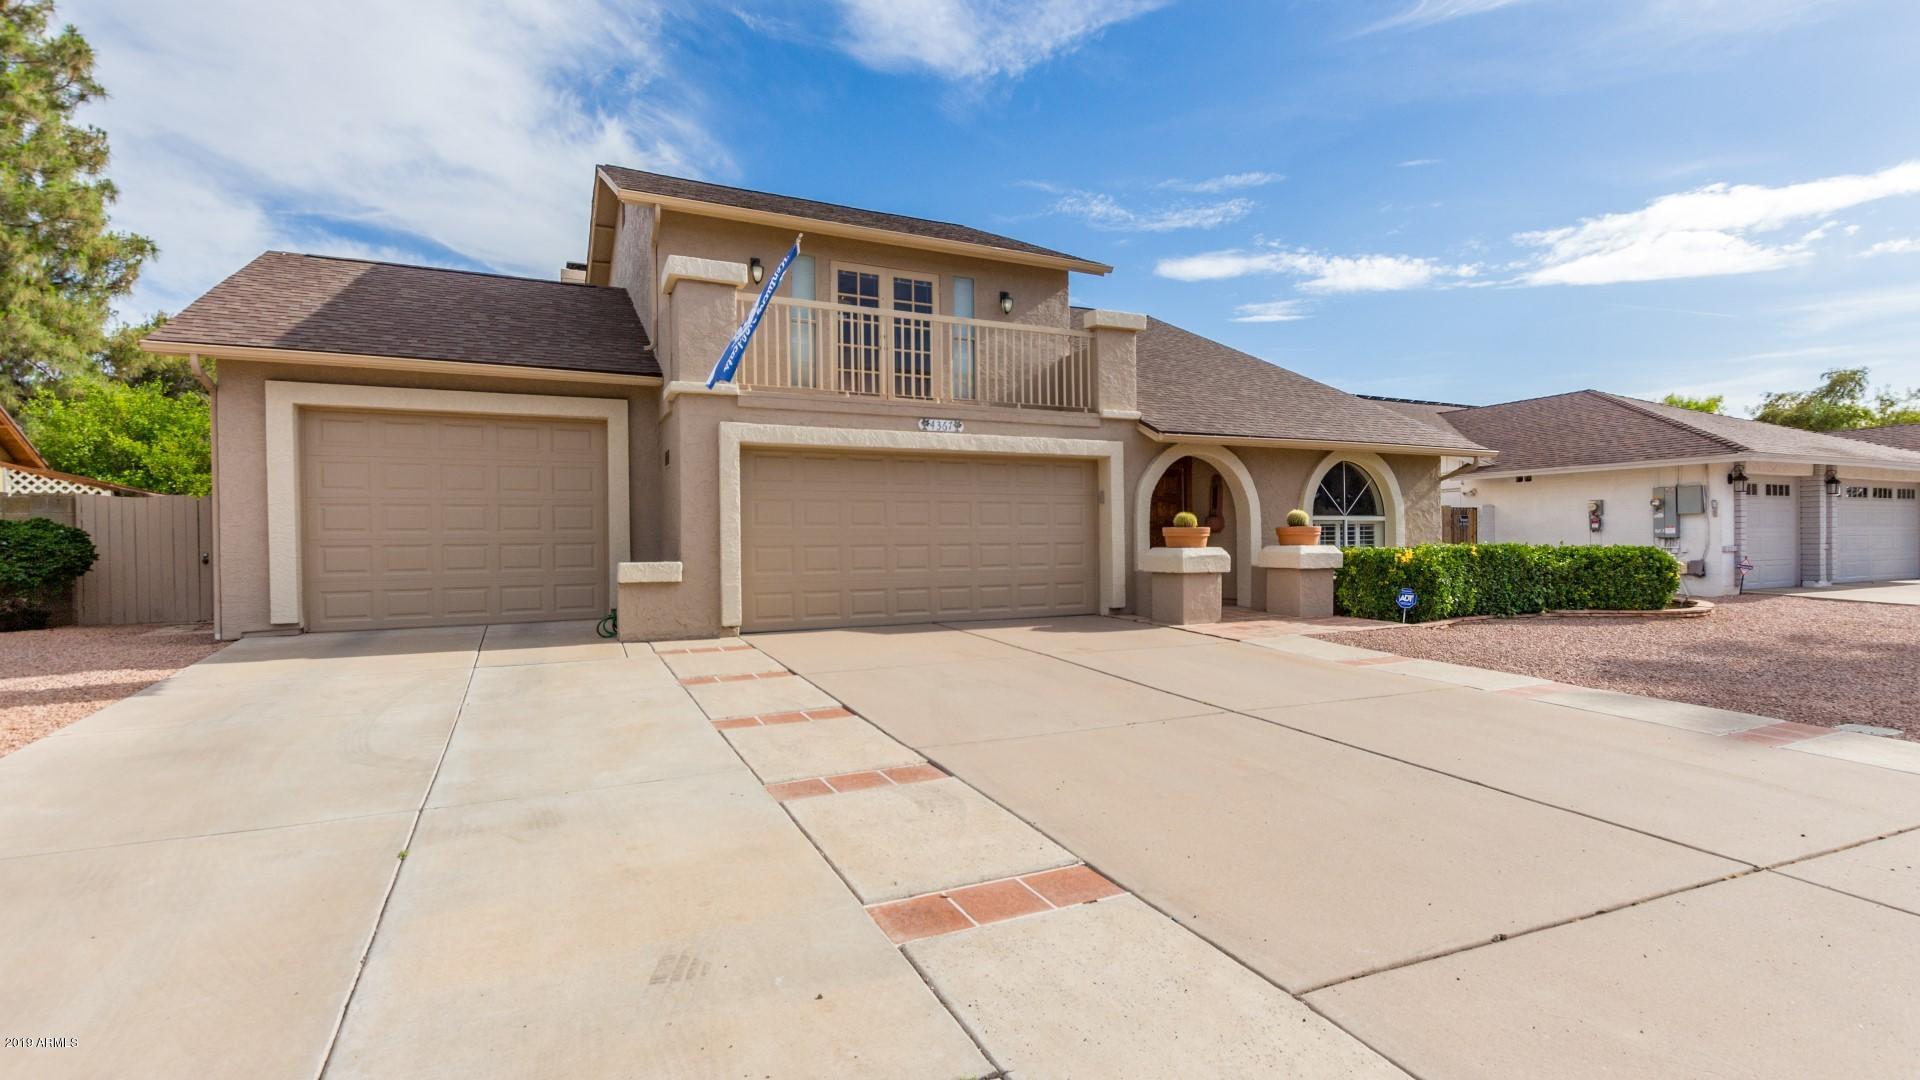 Photo of 4367 W CHARLESTON Avenue, Glendale, AZ 85308